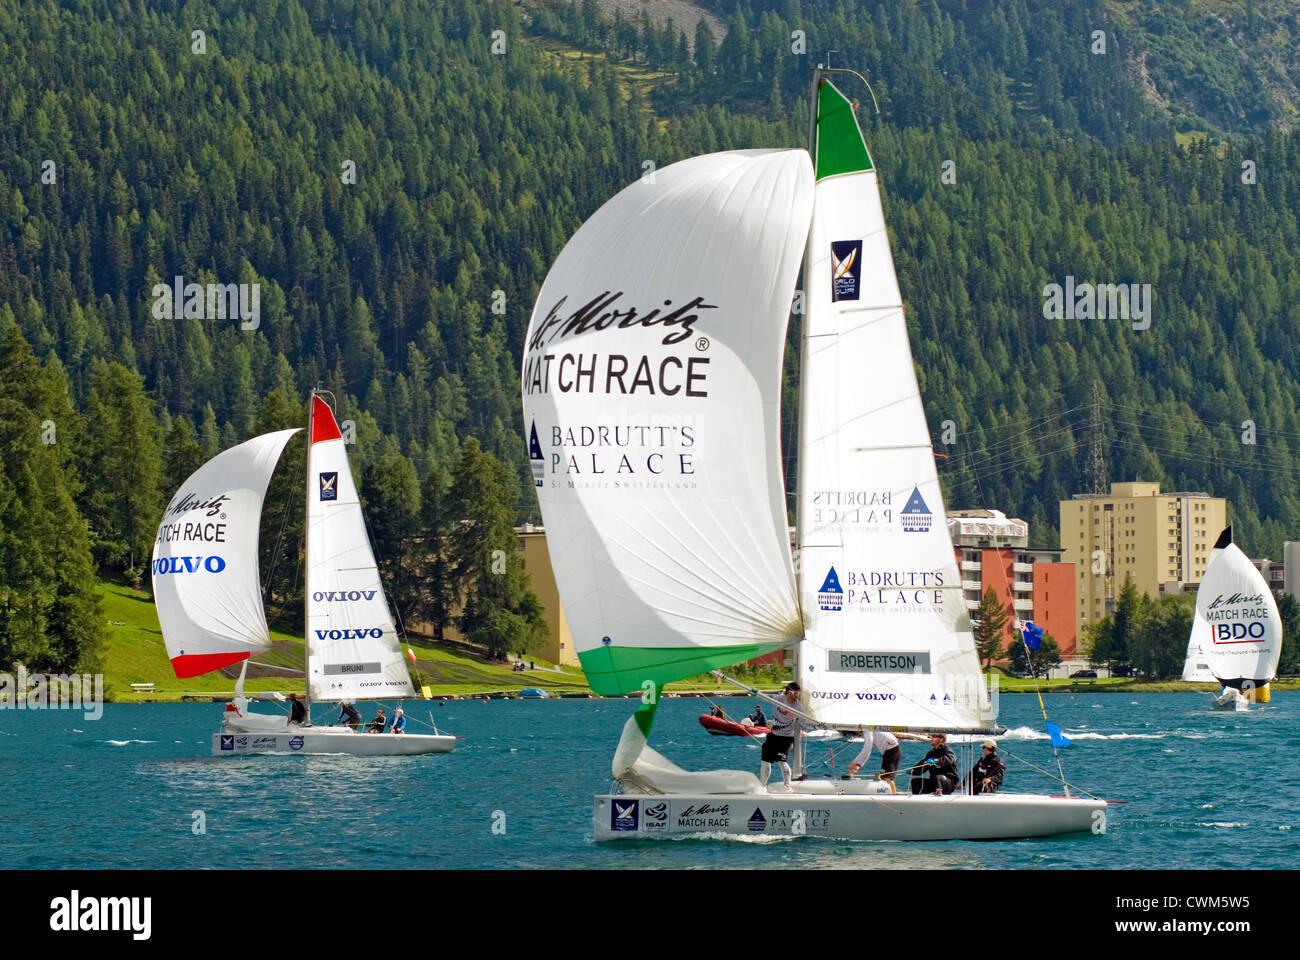 Sailing boats racing during the Match Race, St Moritz, Switzerland | Segelboote waehrend des Match Races, St.Moritz, - Stock Image